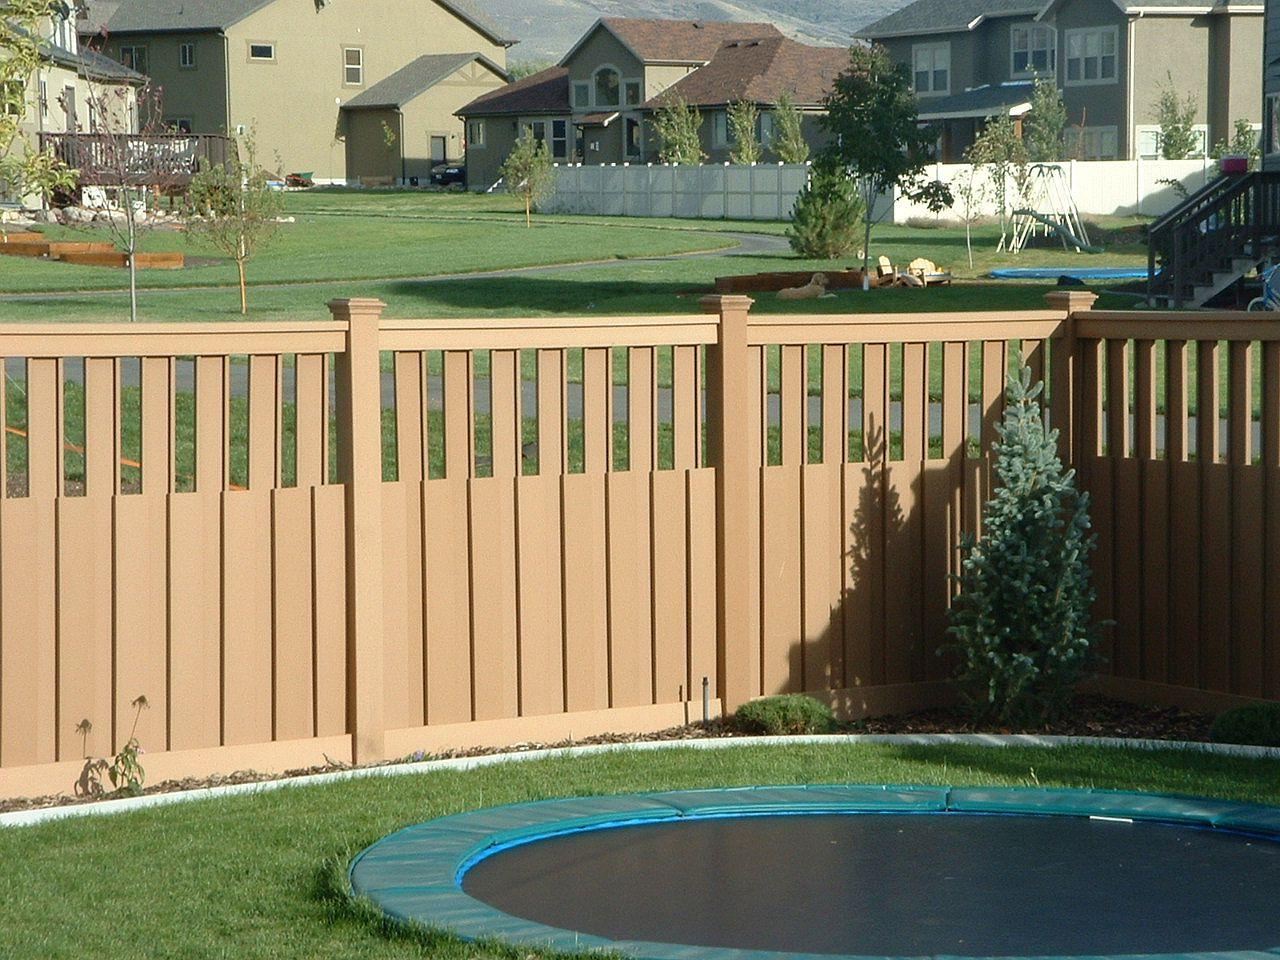 Backyard fencing ideas homesfeed for Short fence ideas